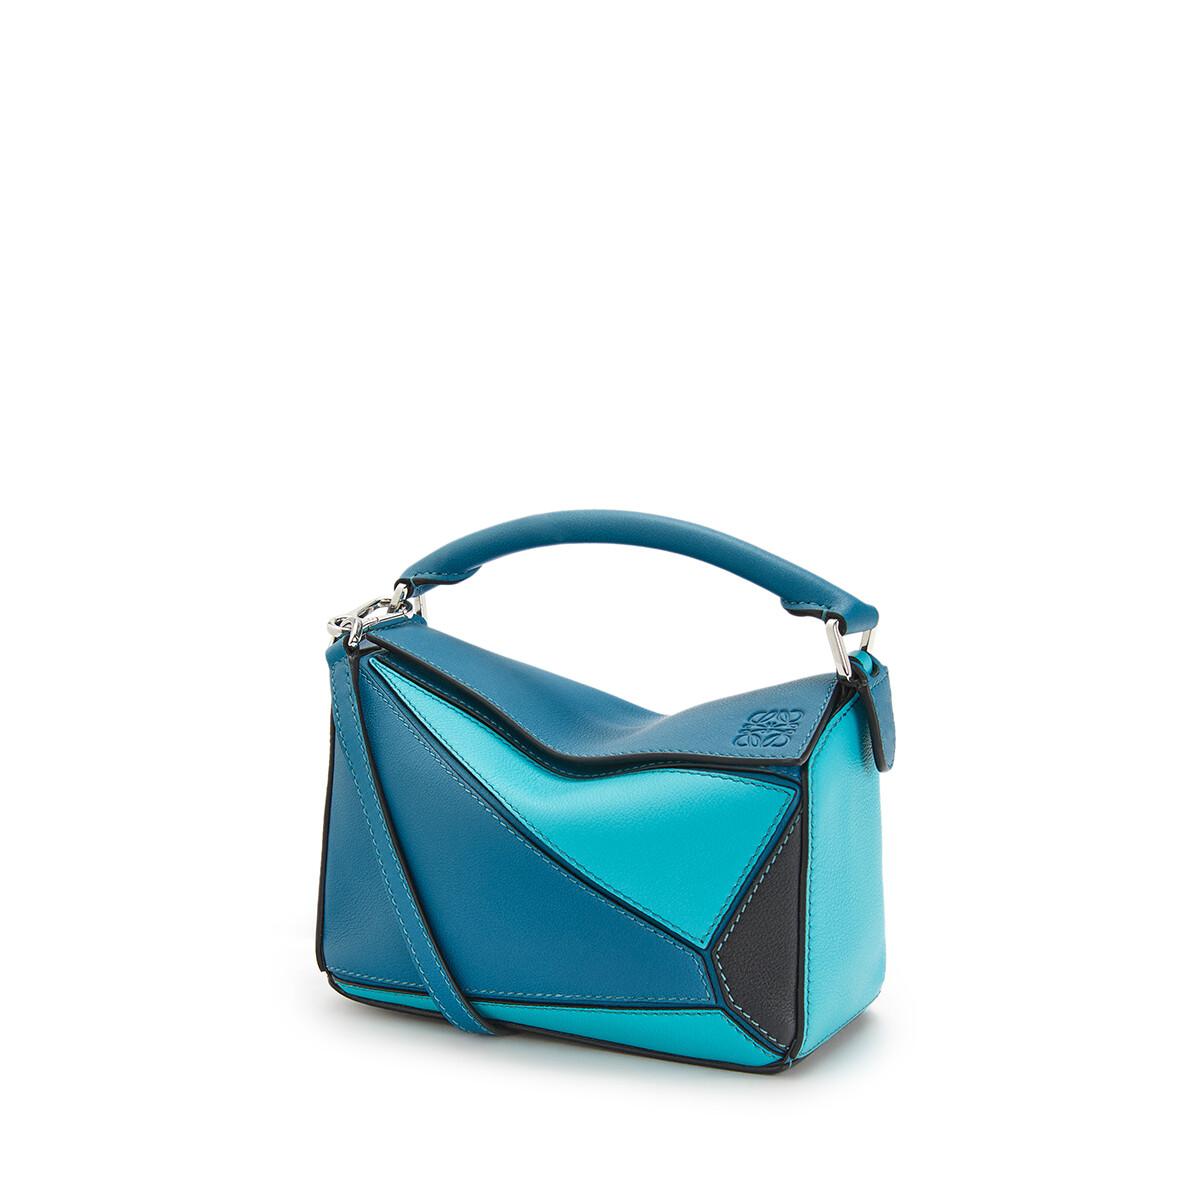 LOEWE Bolso Puzzle Mini Azul Laguna Oscuro/Negro front